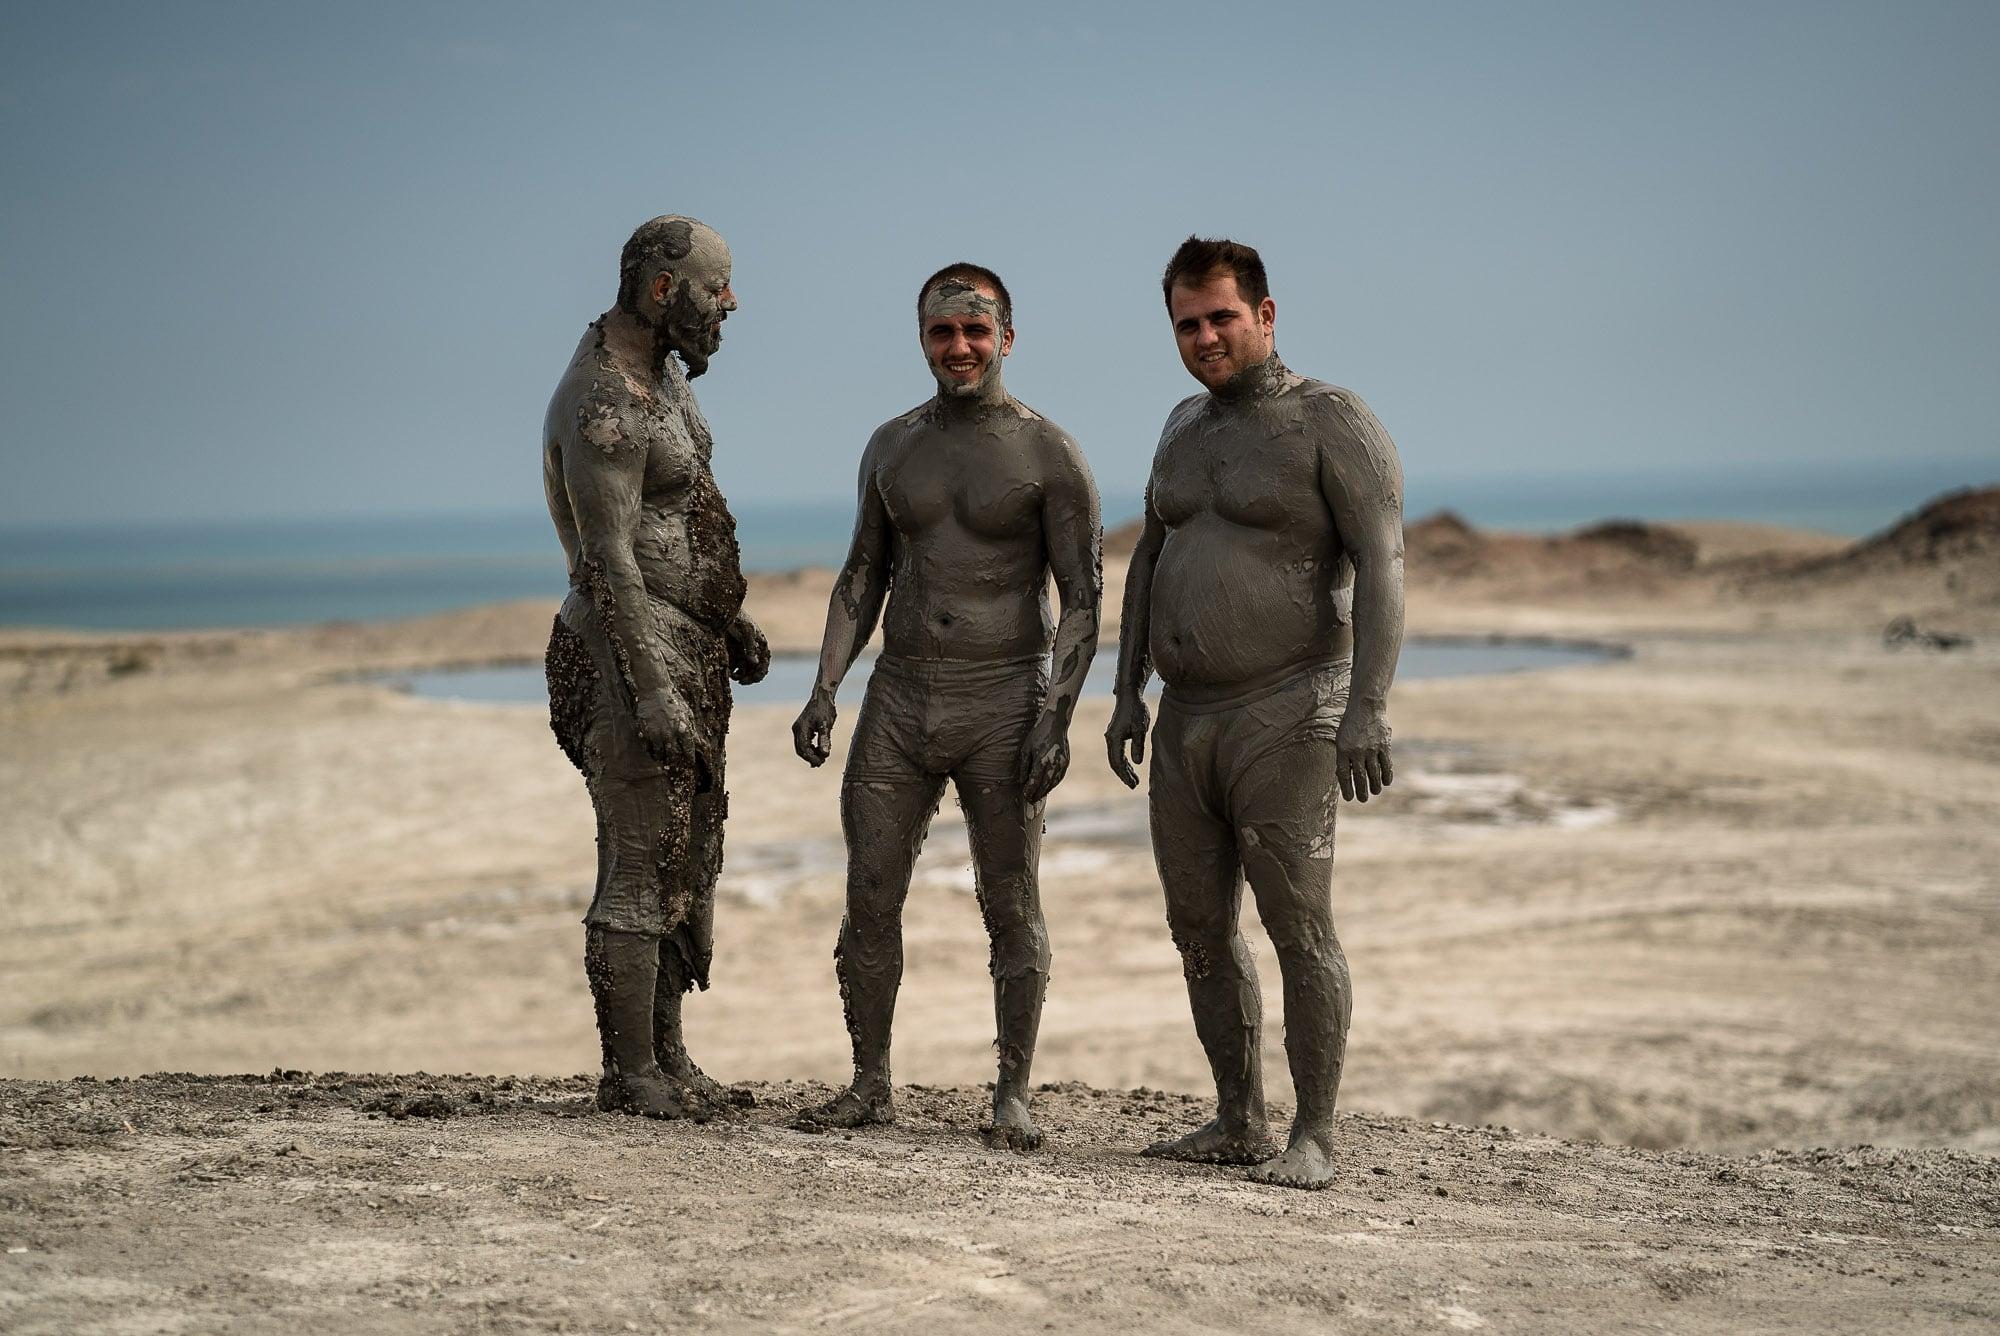 mud bathers